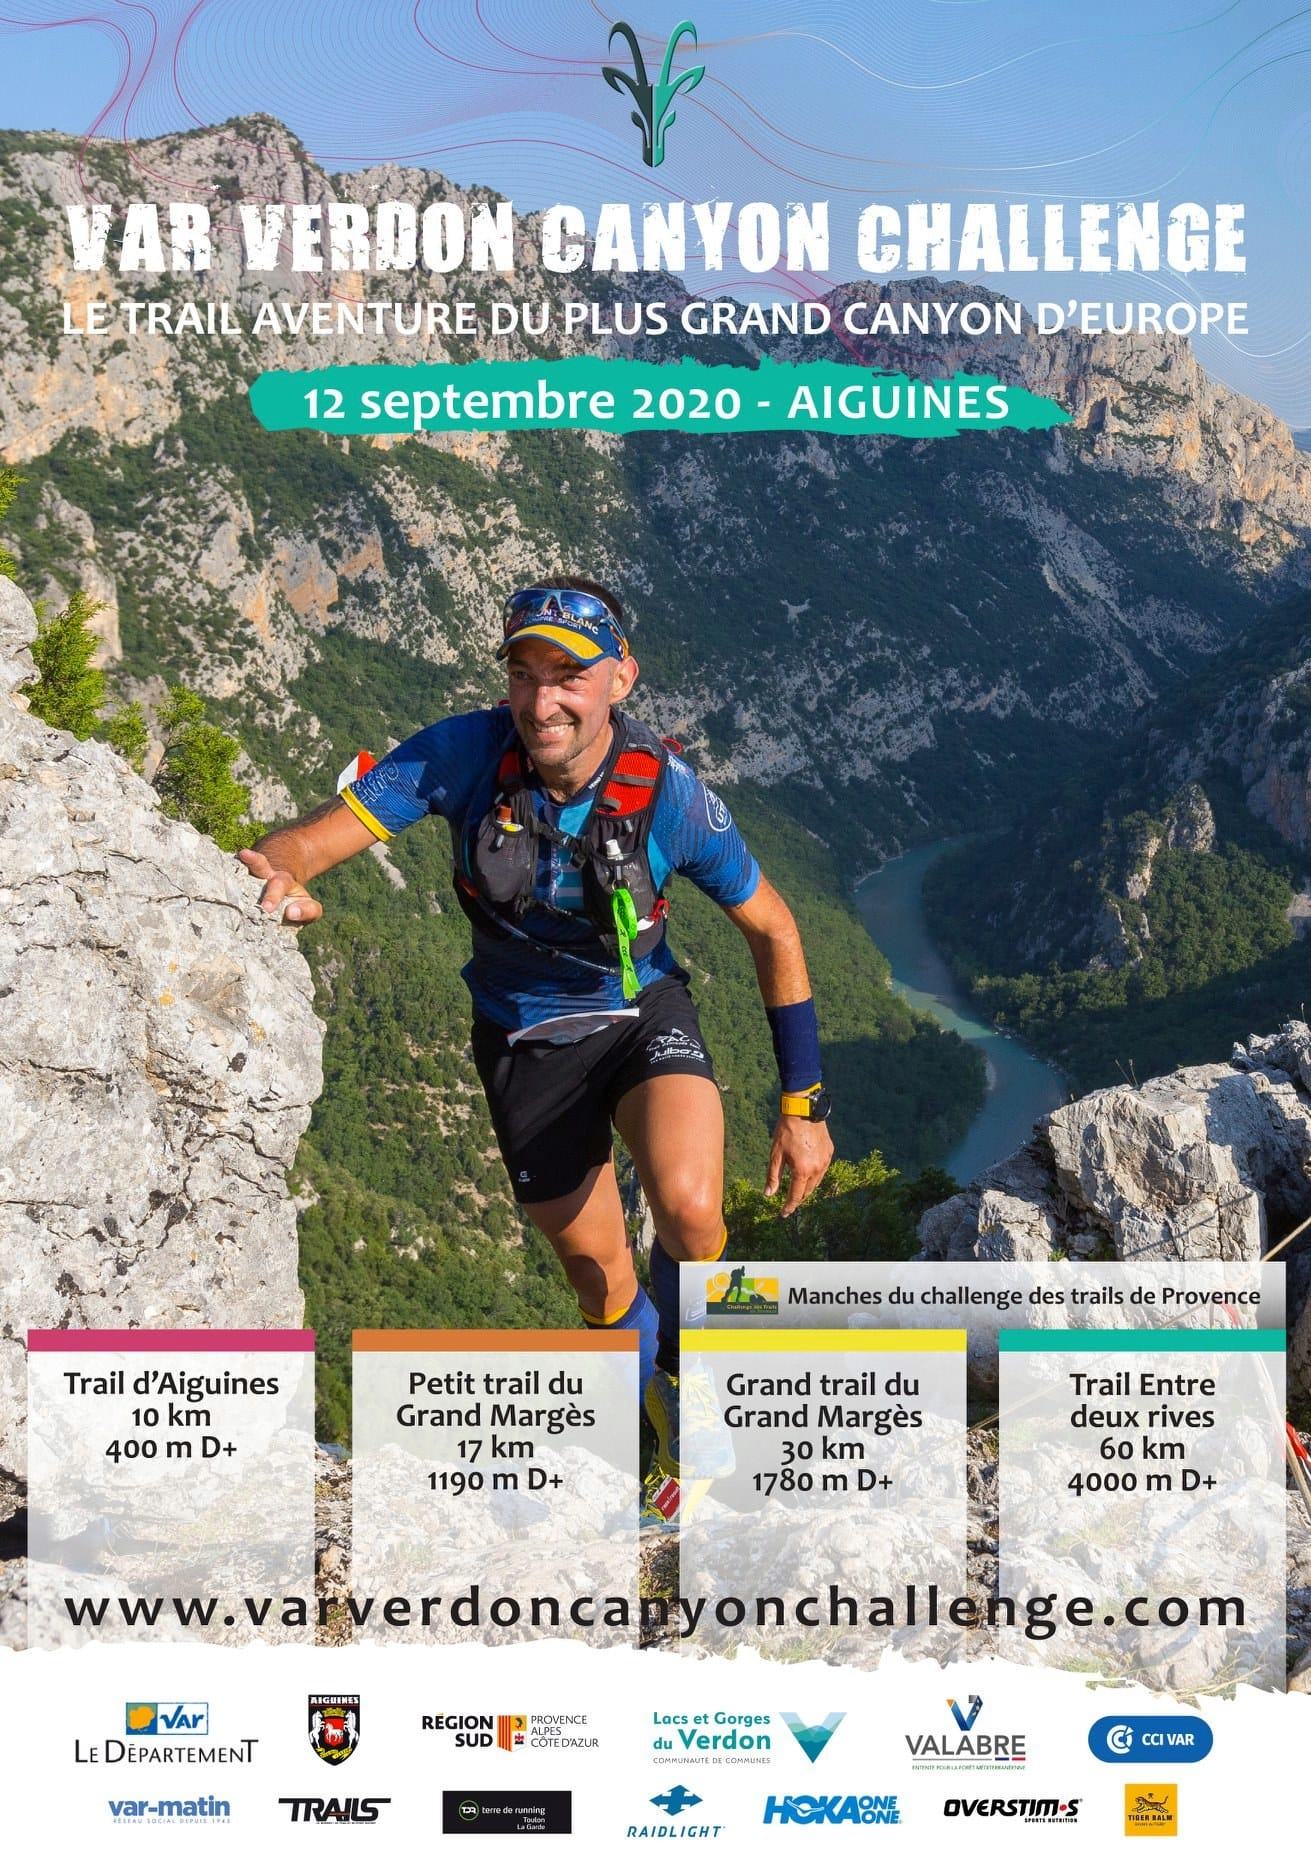 Affiche Var Verdon Canyon Challenge 2020